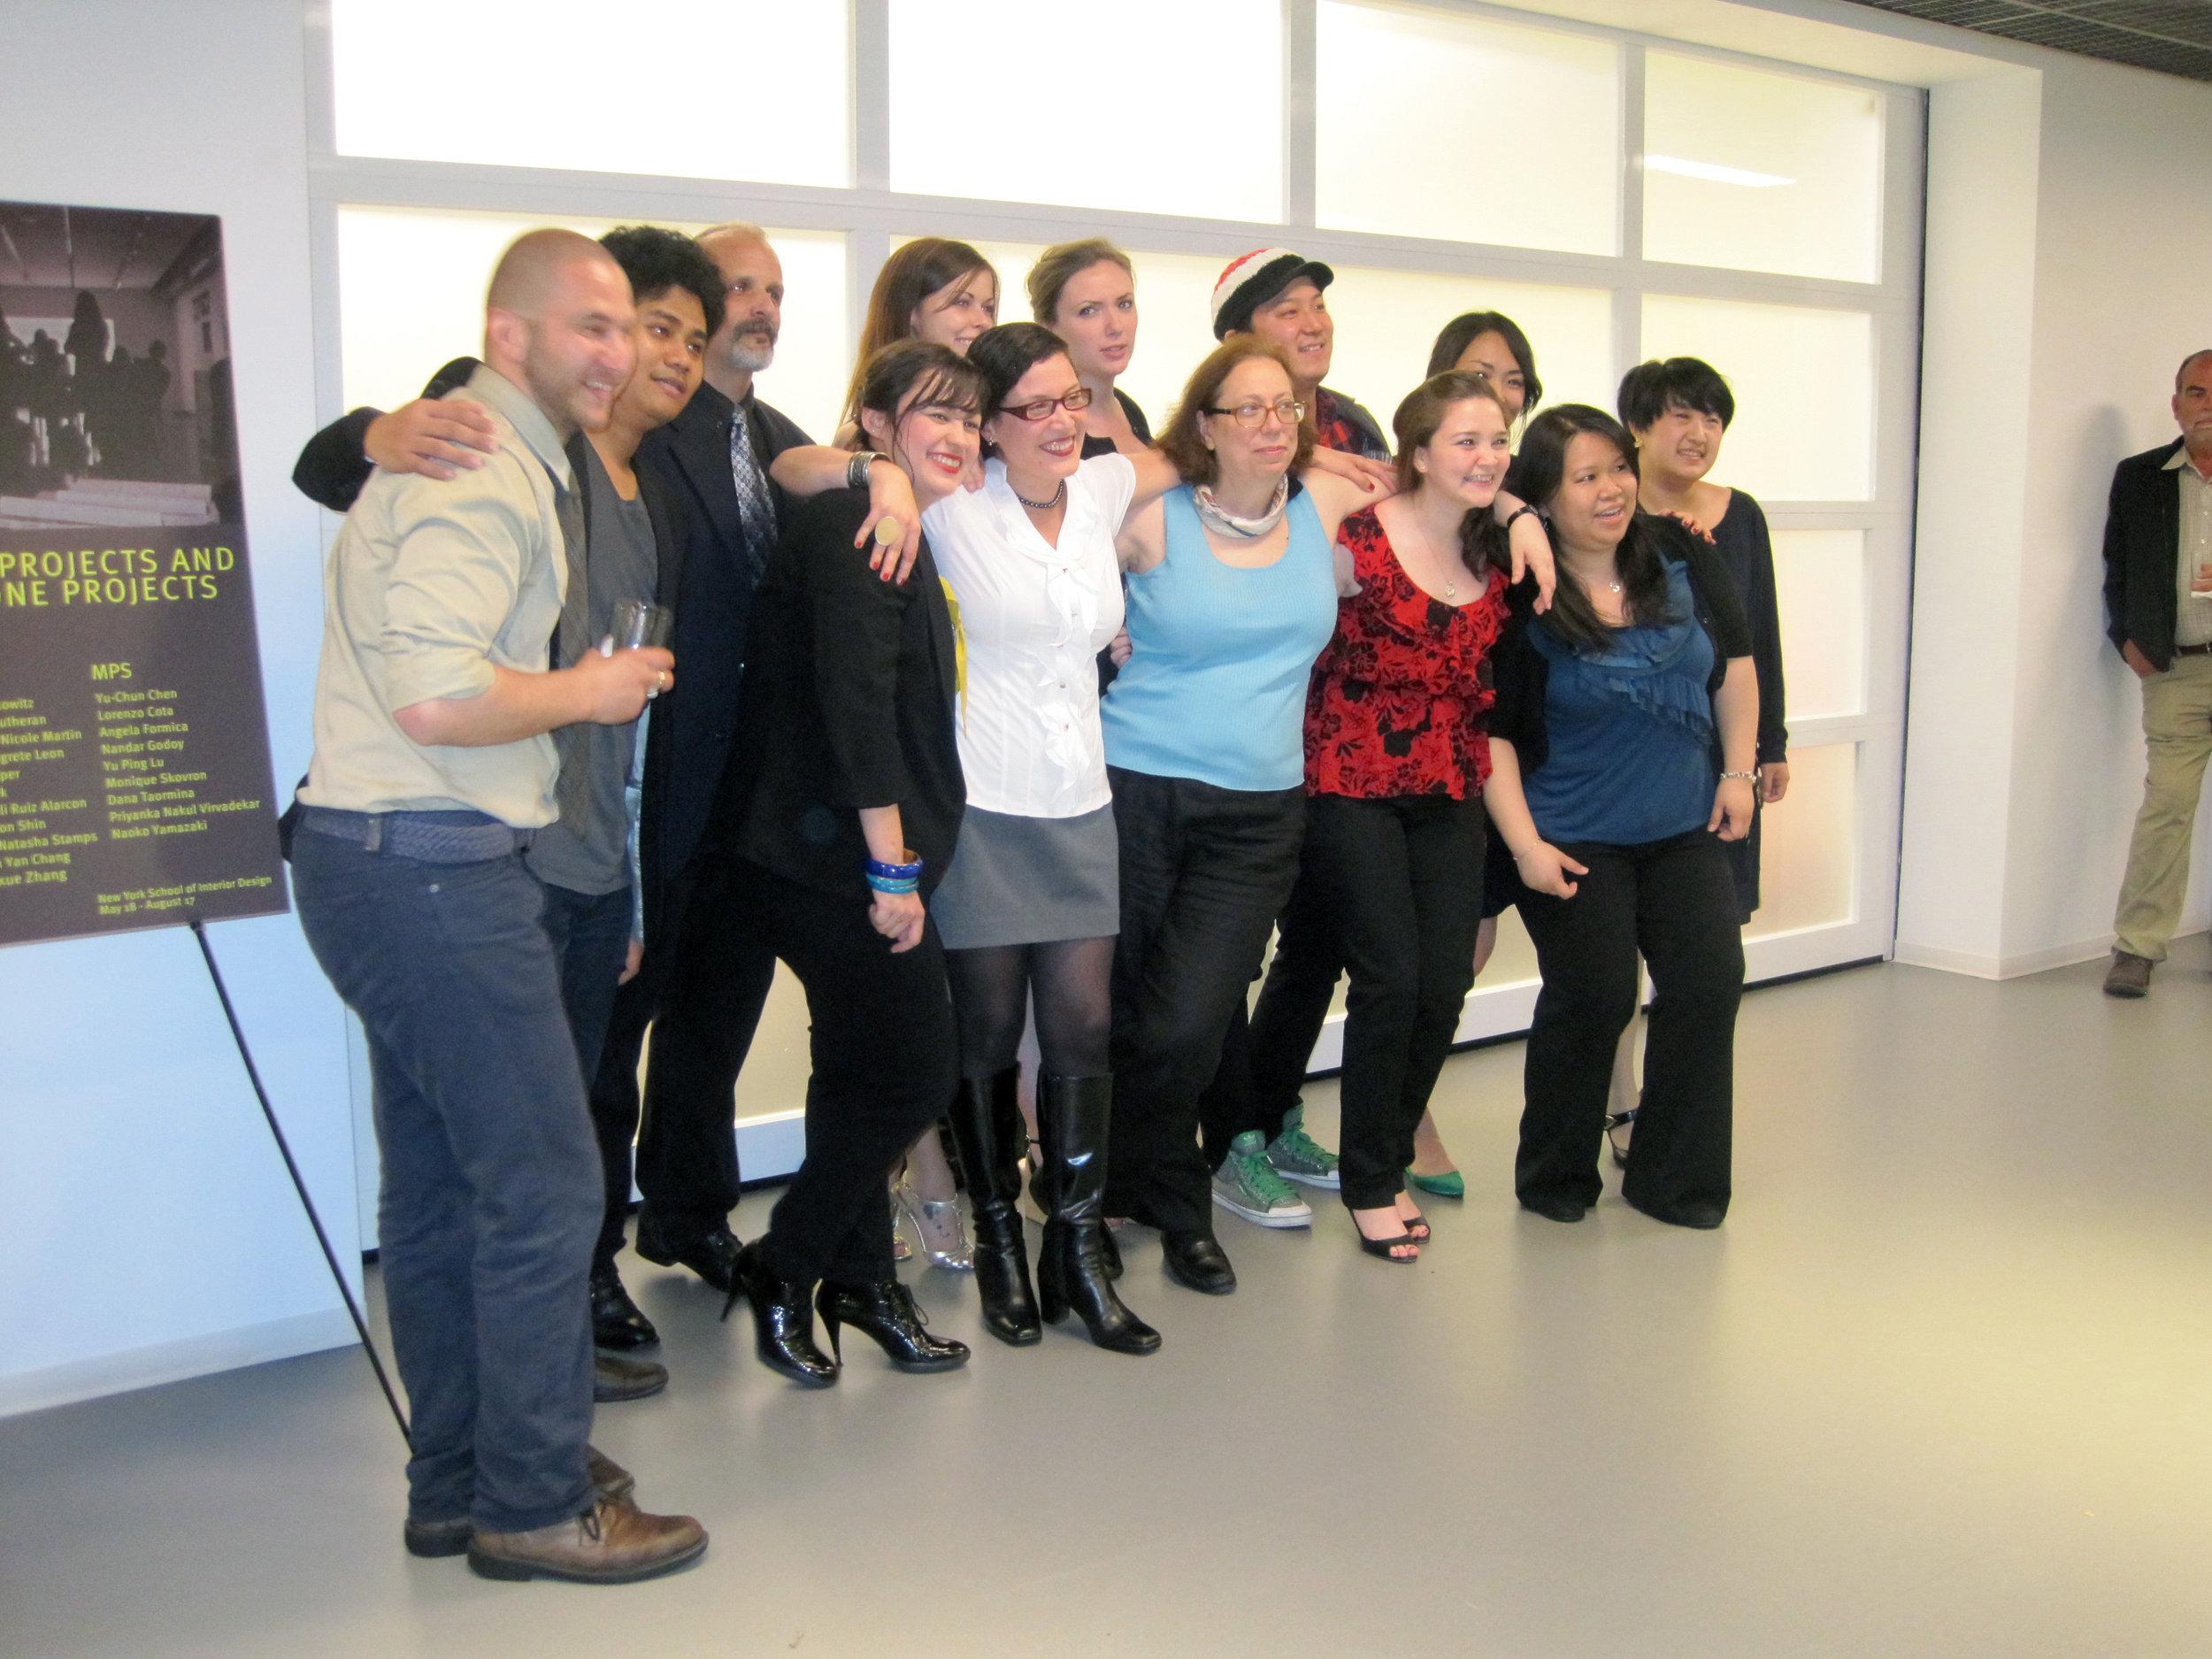 nysid-graduate-center--lobby-with-students_5809472944_o[1].jpg